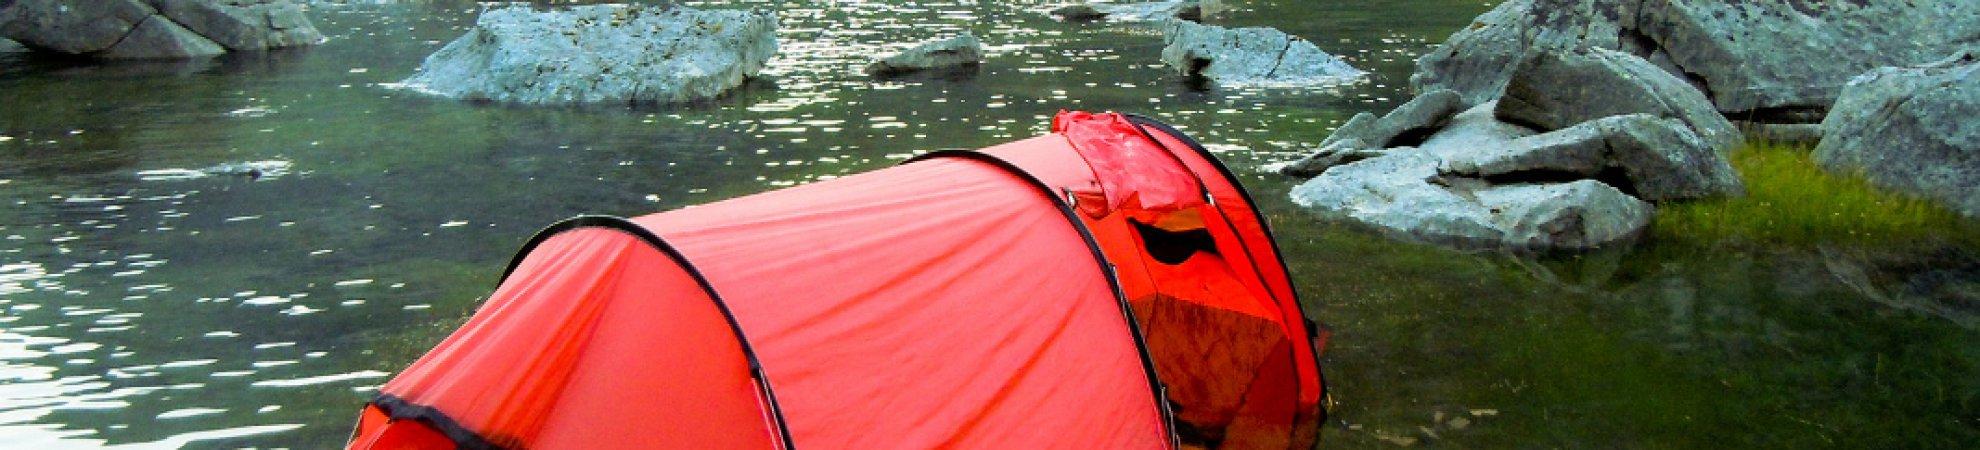 camping fails